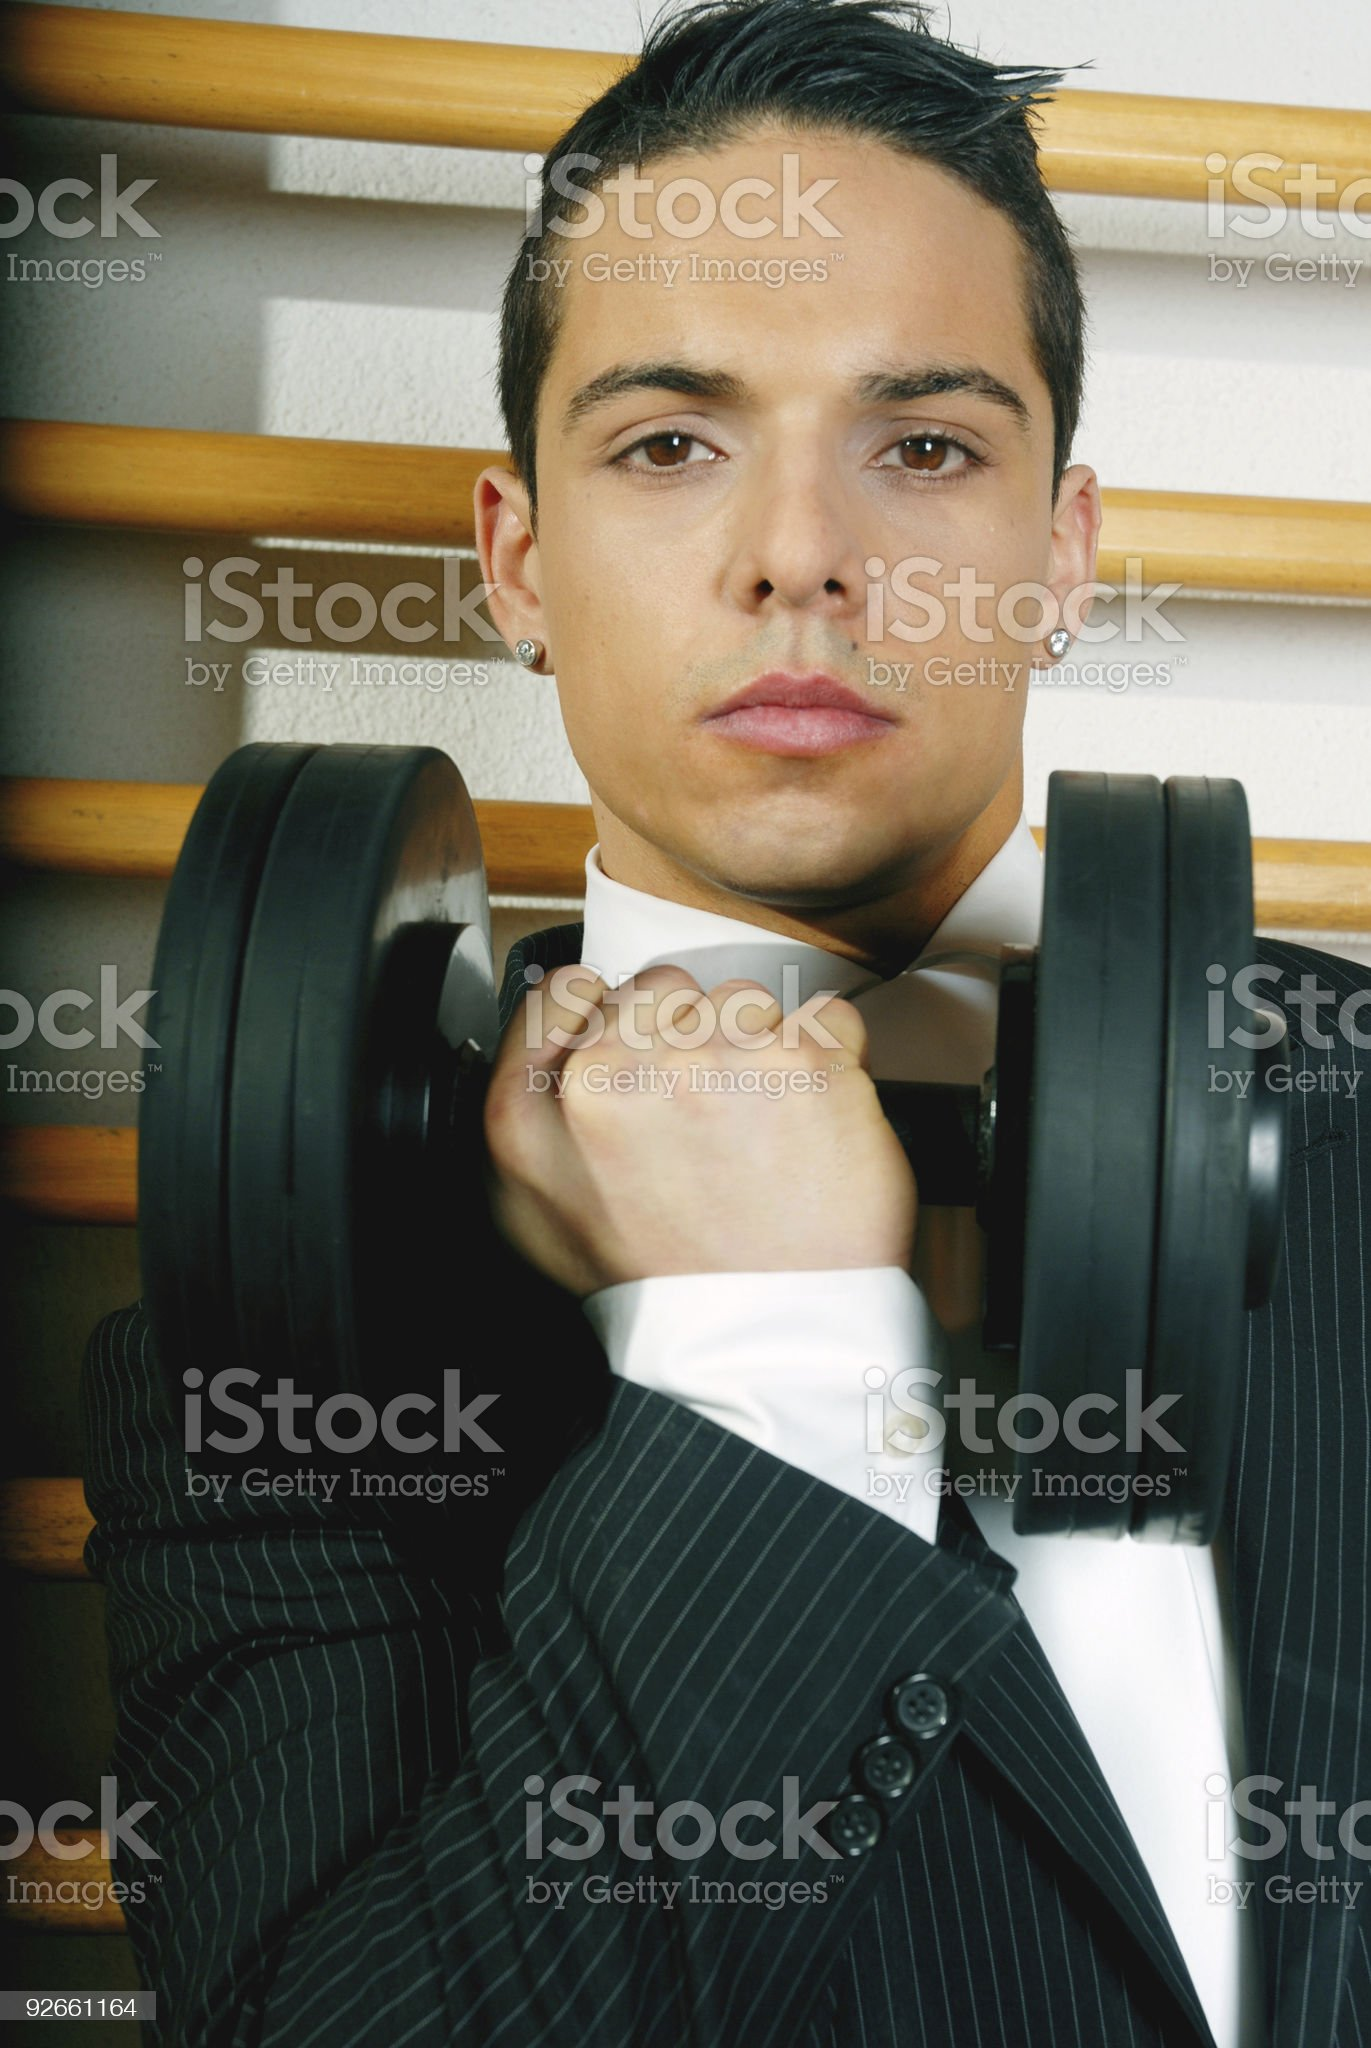 Strength royalty-free stock photo